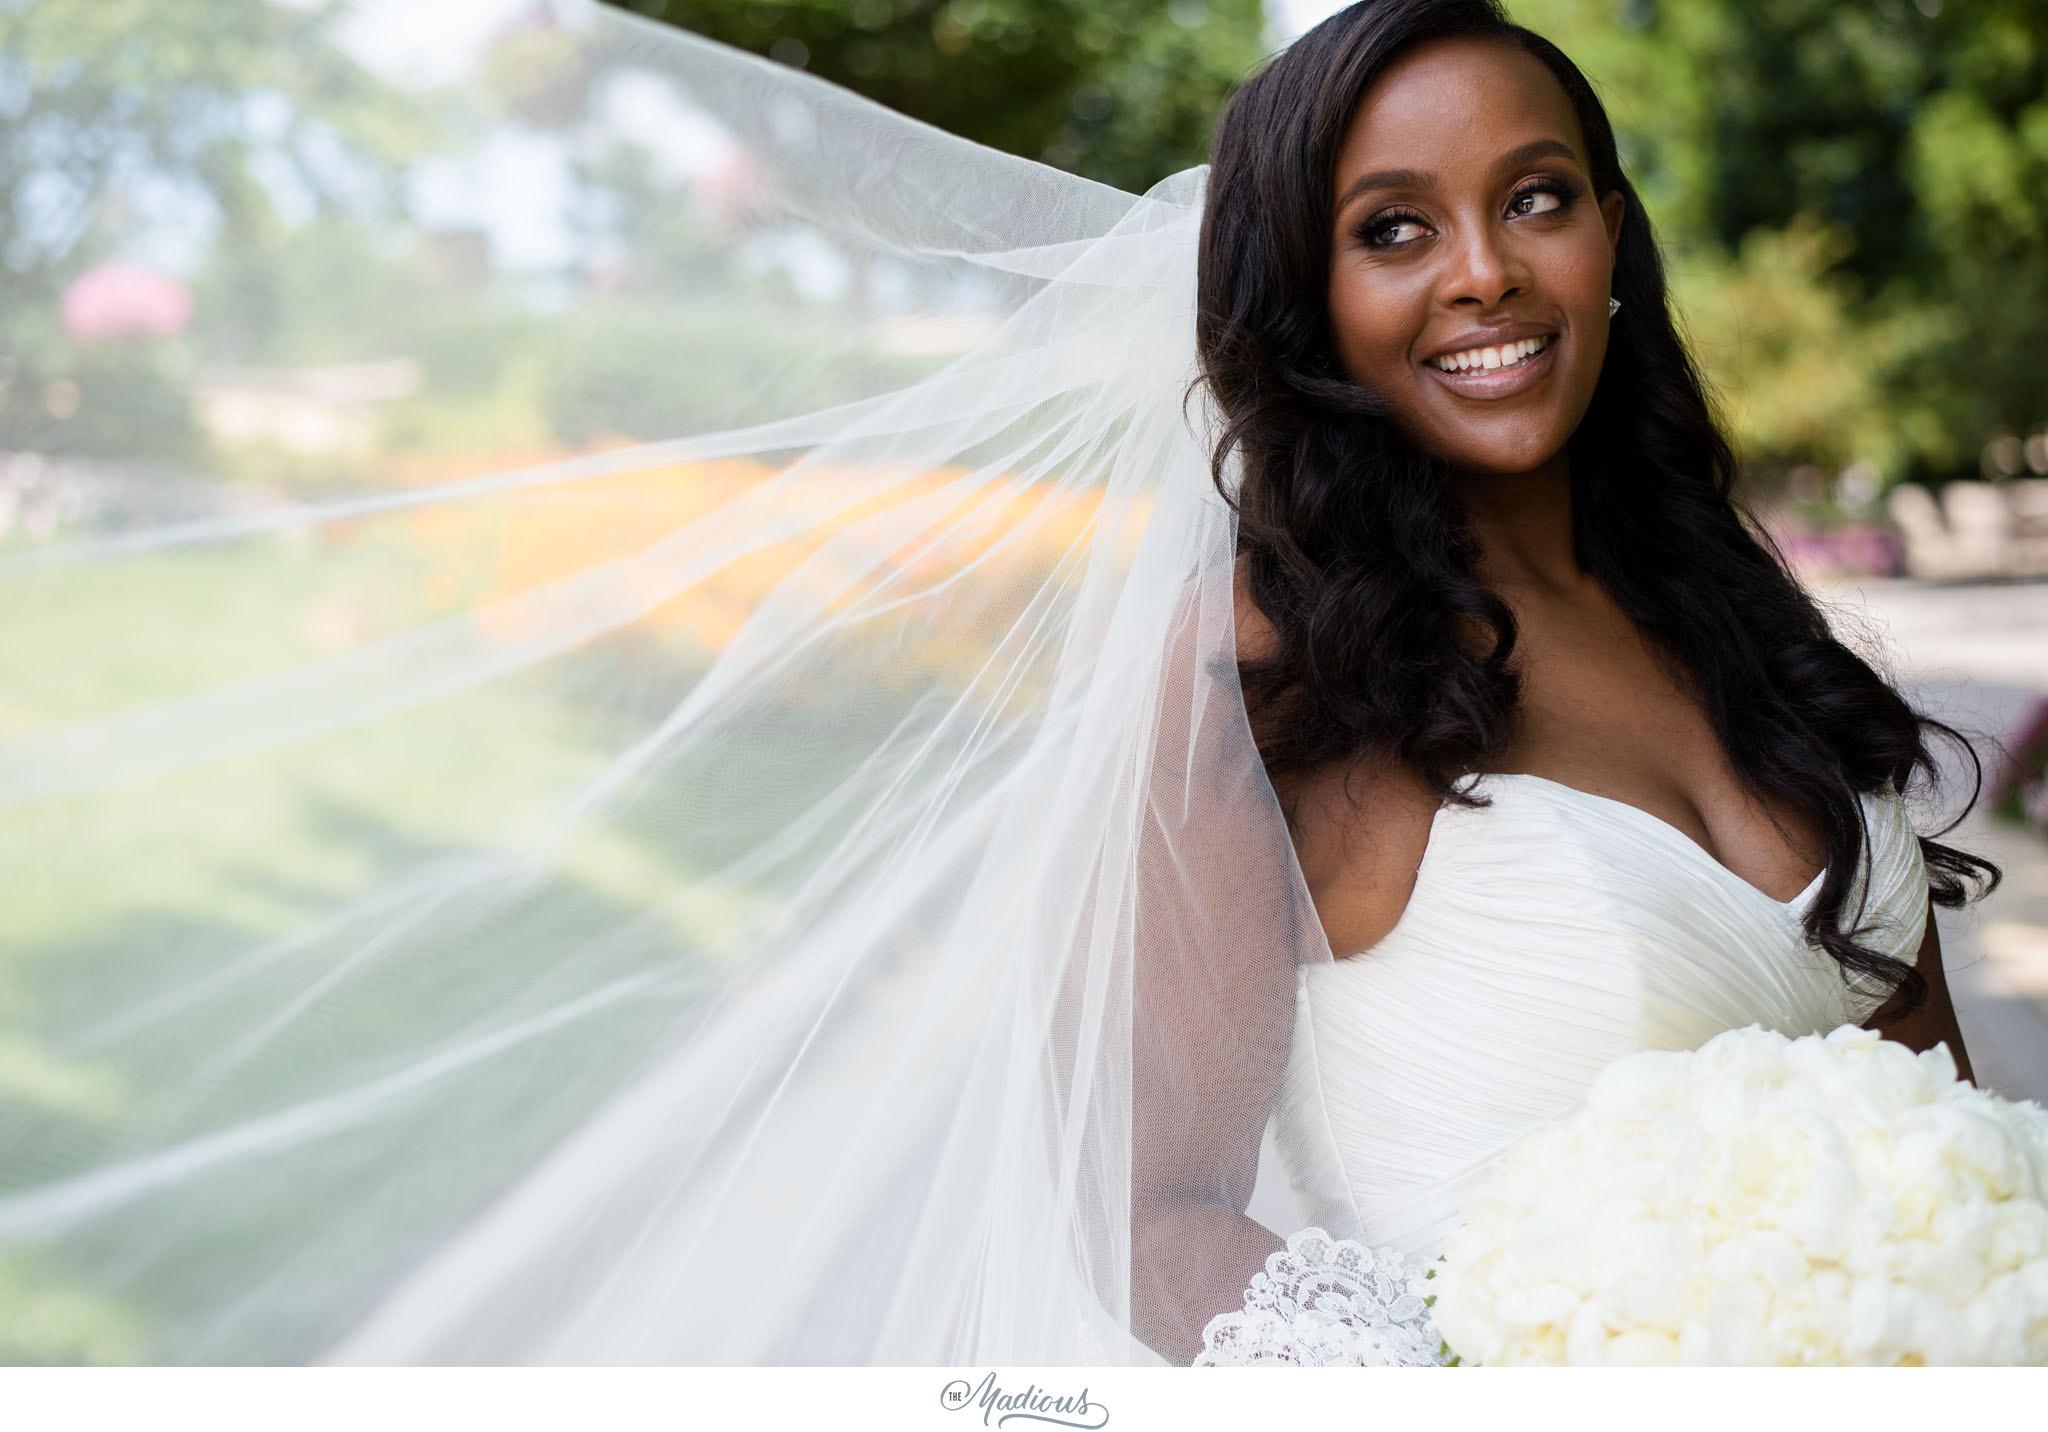 nmwa+wedding,+women+in+the+arts+wedding,+ethiopian+wedding,+dc+wedding+0123.jpg